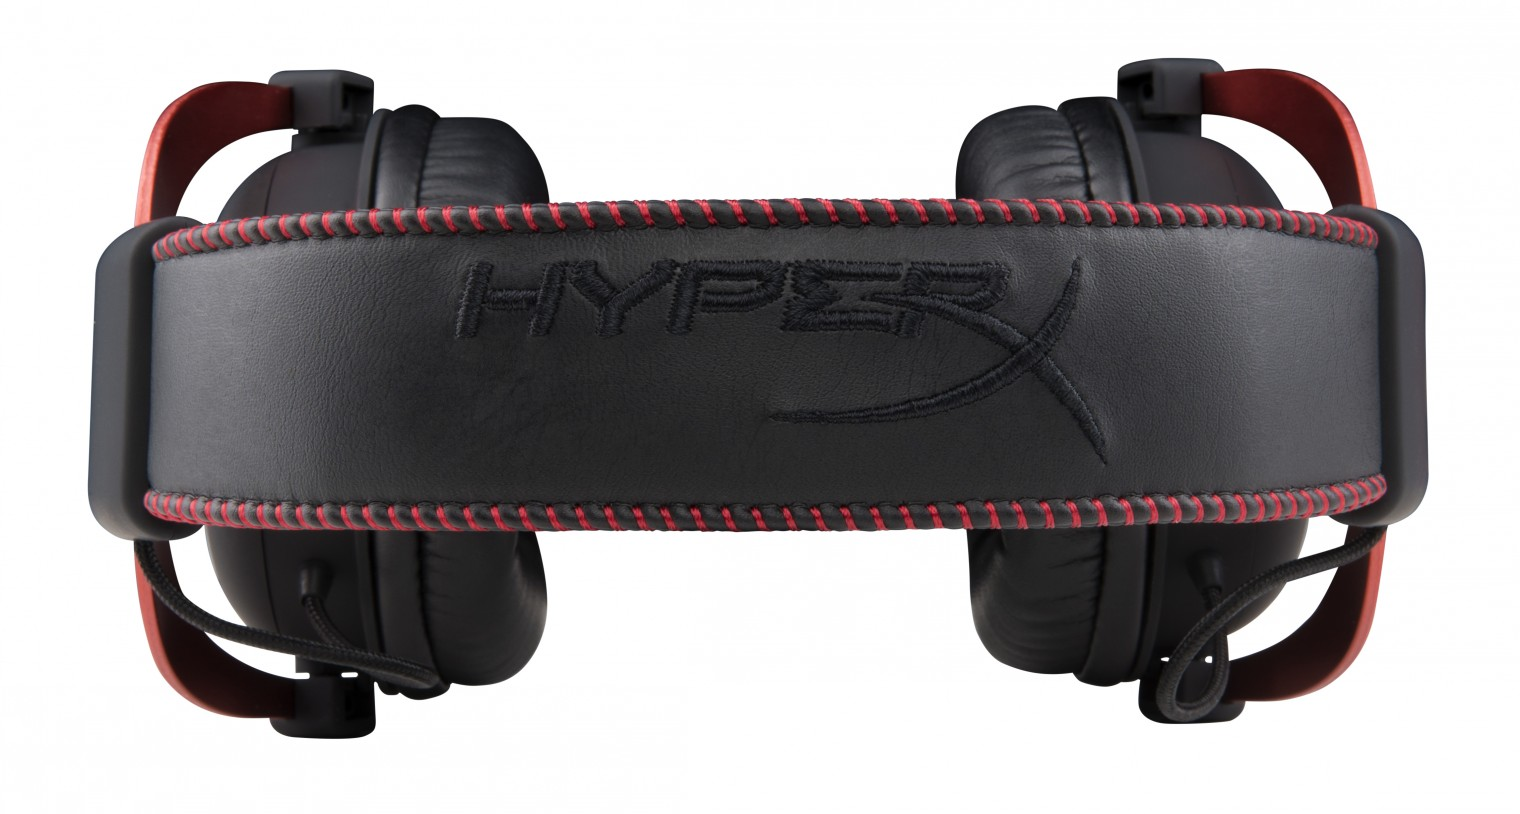 Sluchátka s mikrofonem Herní sluchátka Kingston HyperX Cloud II